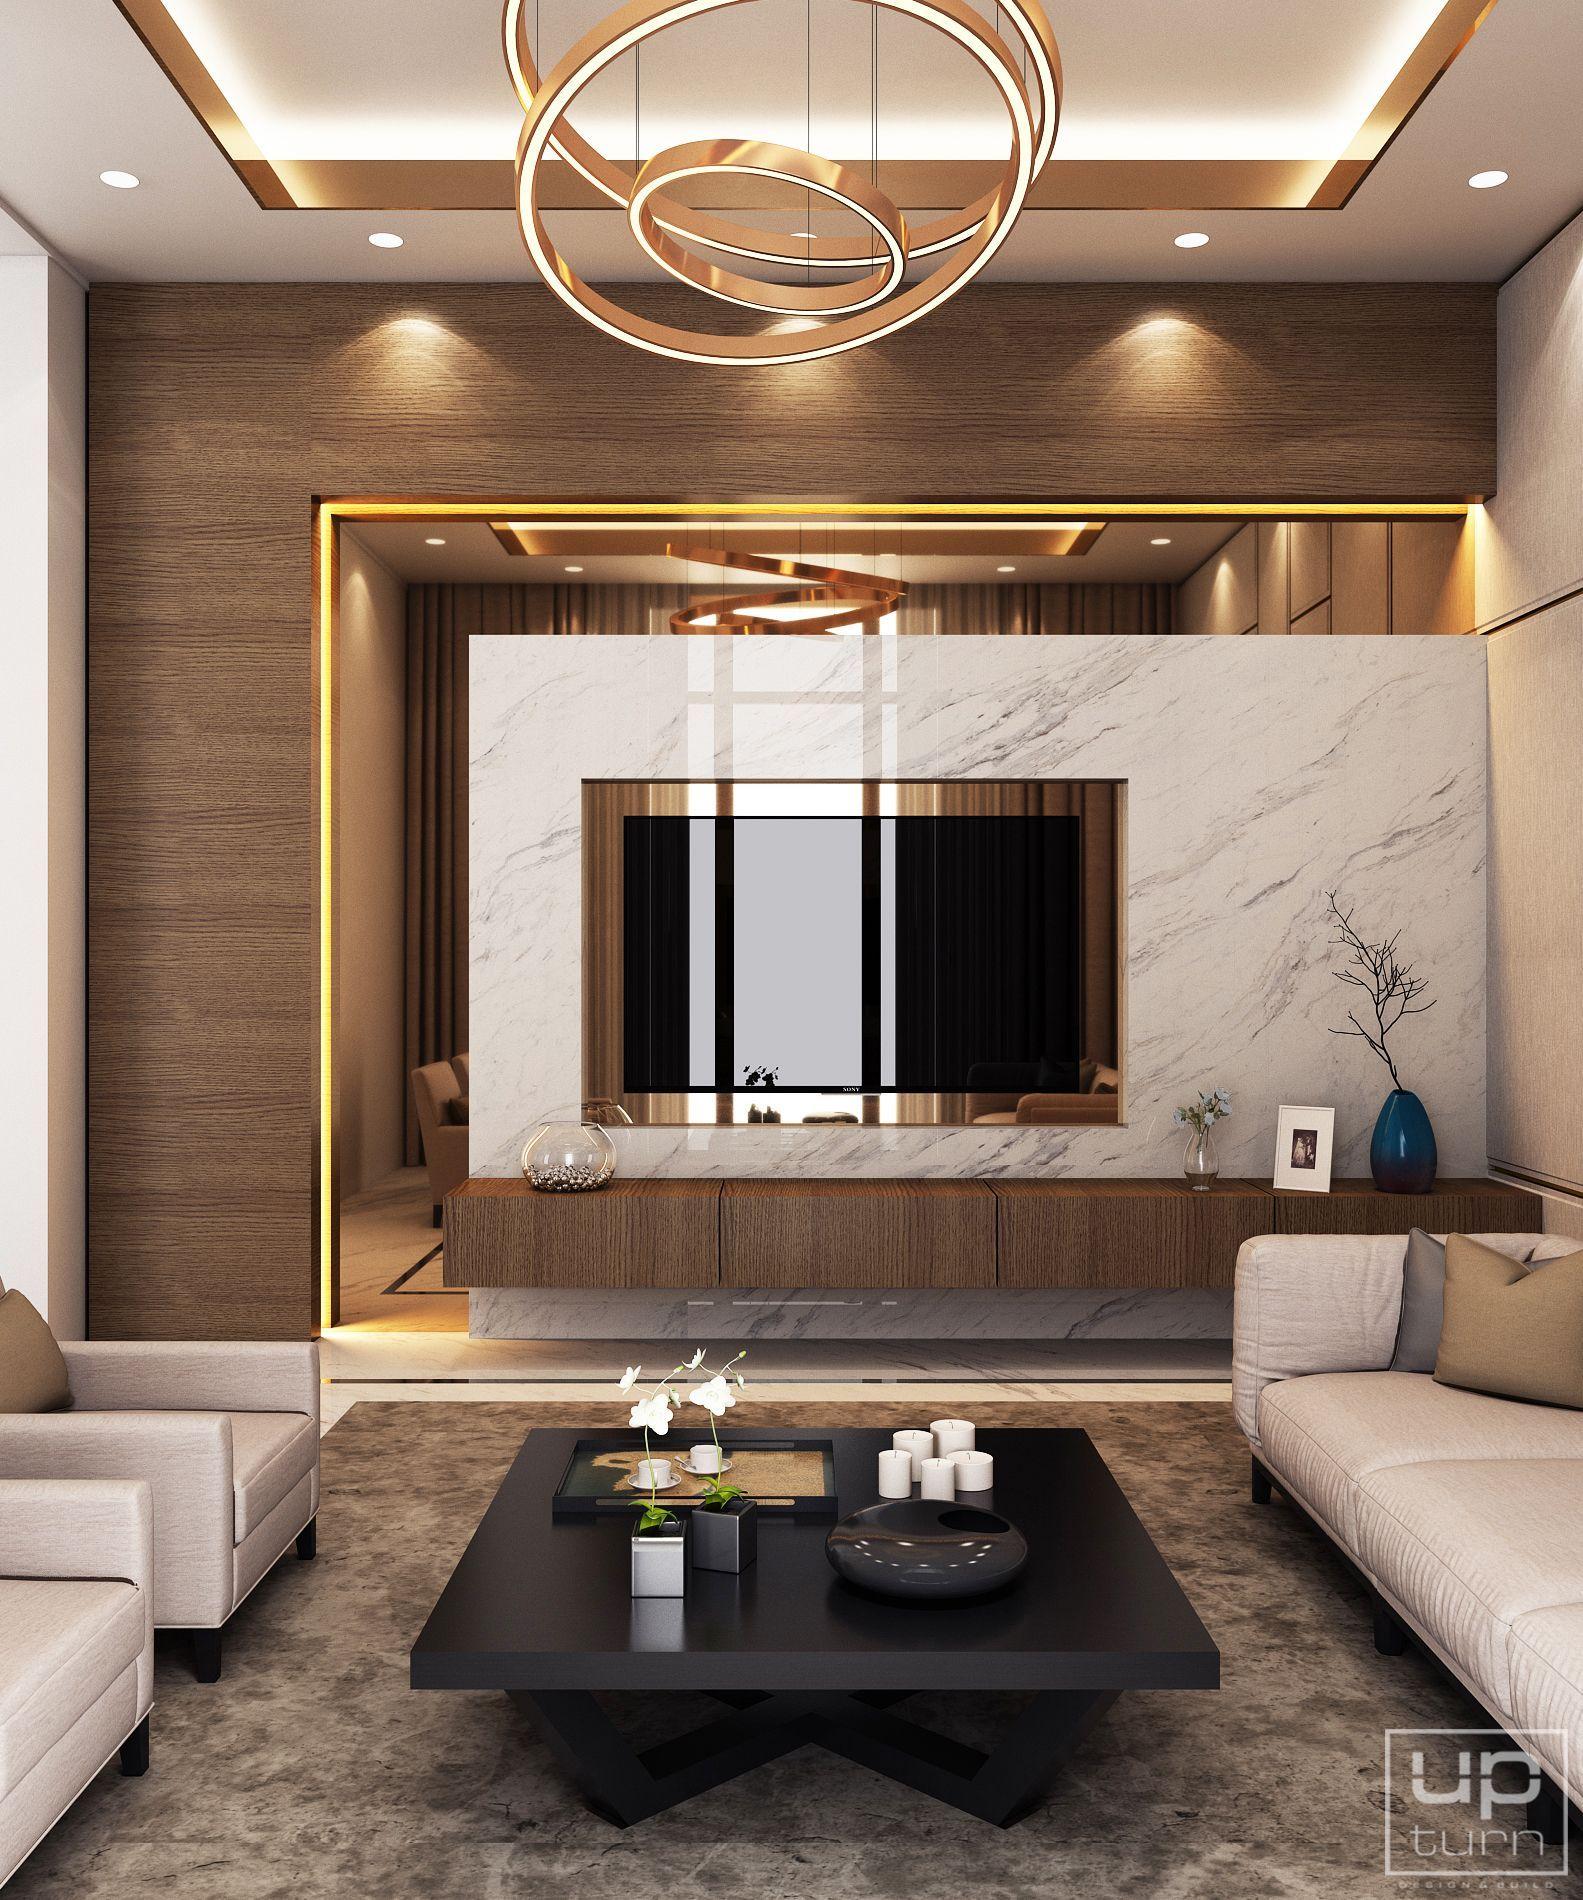 Luxury Modern Villa Qatar On Behance In 2020 Living Room Design Modern Luxury Living Room Luxury Living Room Design